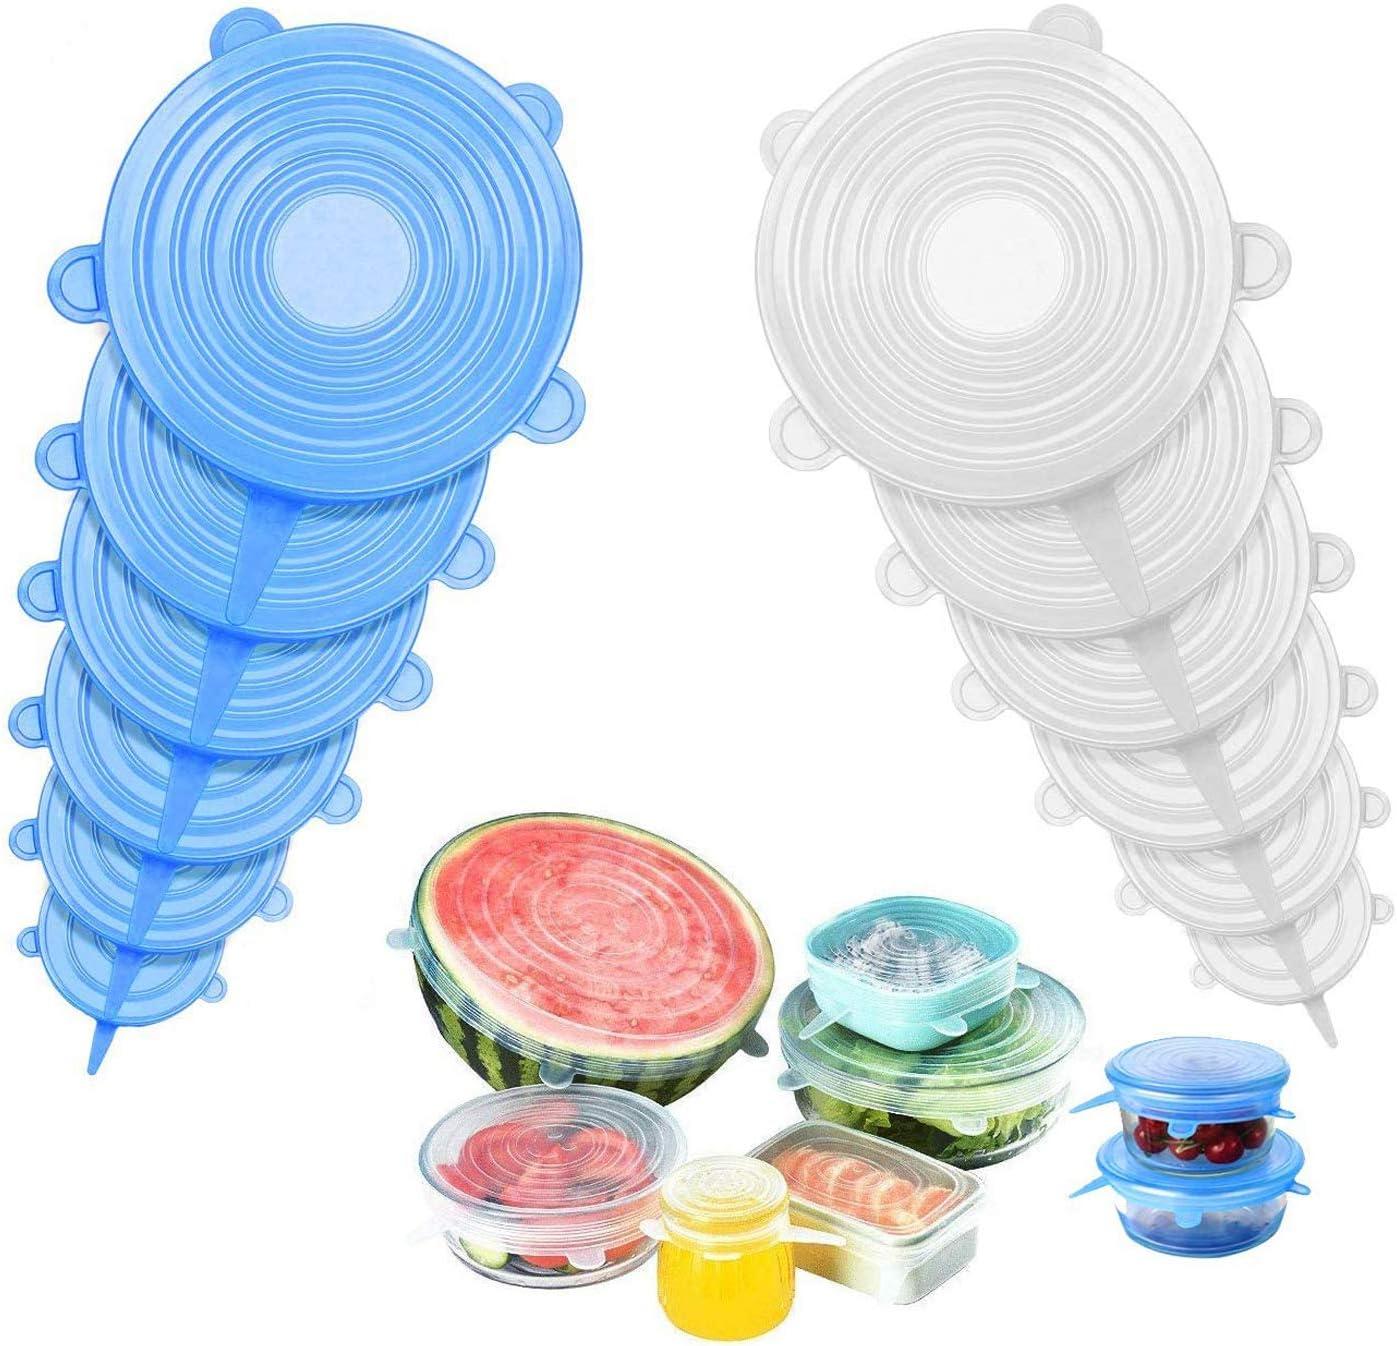 Tazas Tapa de Silicona Estirable Cocina Boles Tarros Redondas y Cuadradas Reutilizable expandibles paquete de alimentos Cubiertas para Alimentos XUBX 12 Piezas Tapas de Silicona El/ásticas